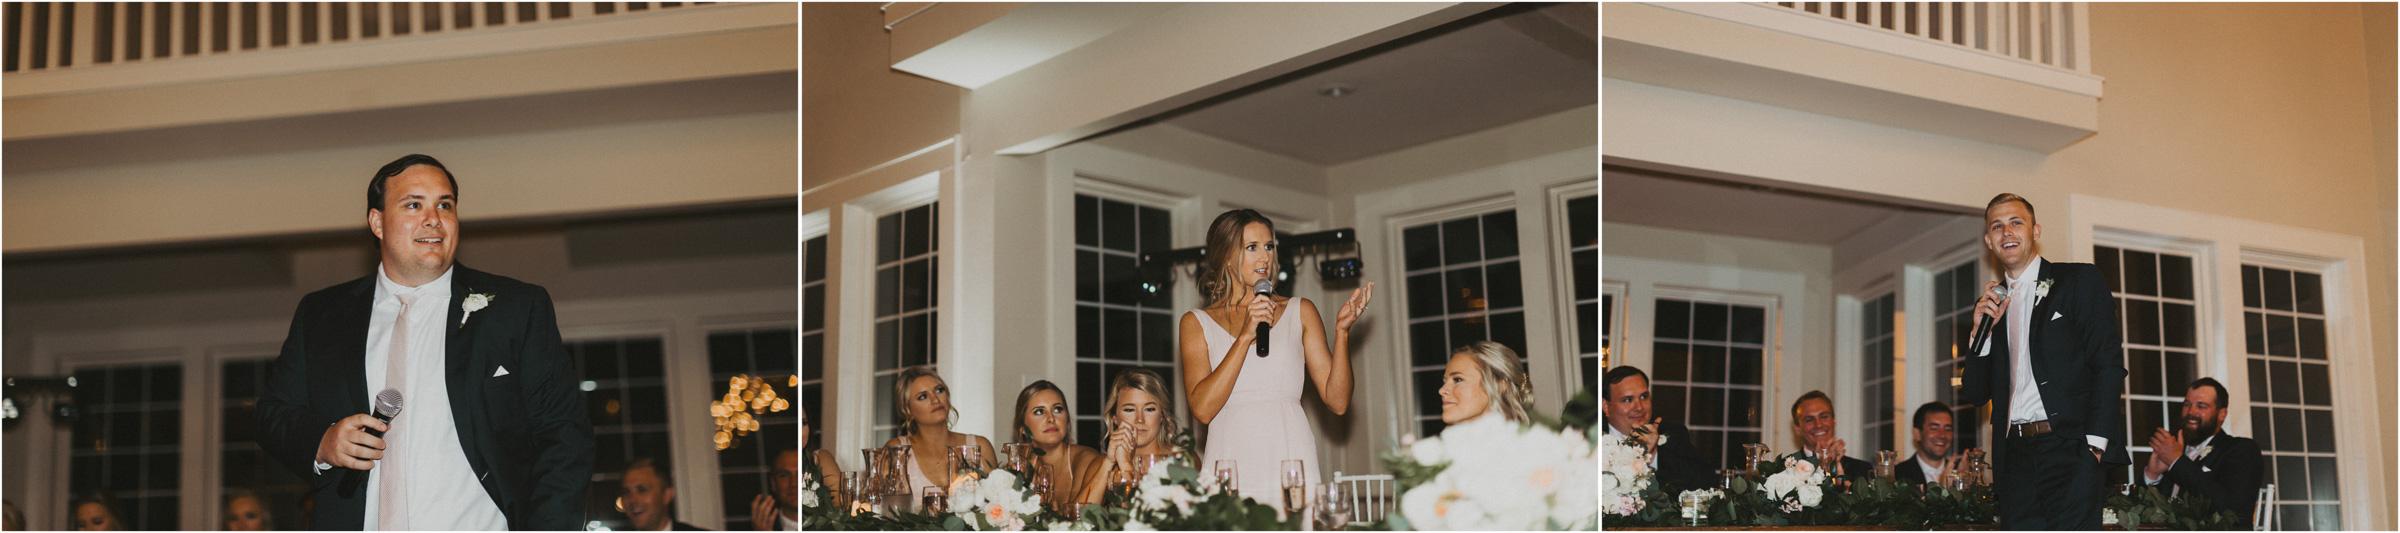 alyssa barletter photography hawthorne house summer outdoor wedding southern charm inspiration-68.jpg